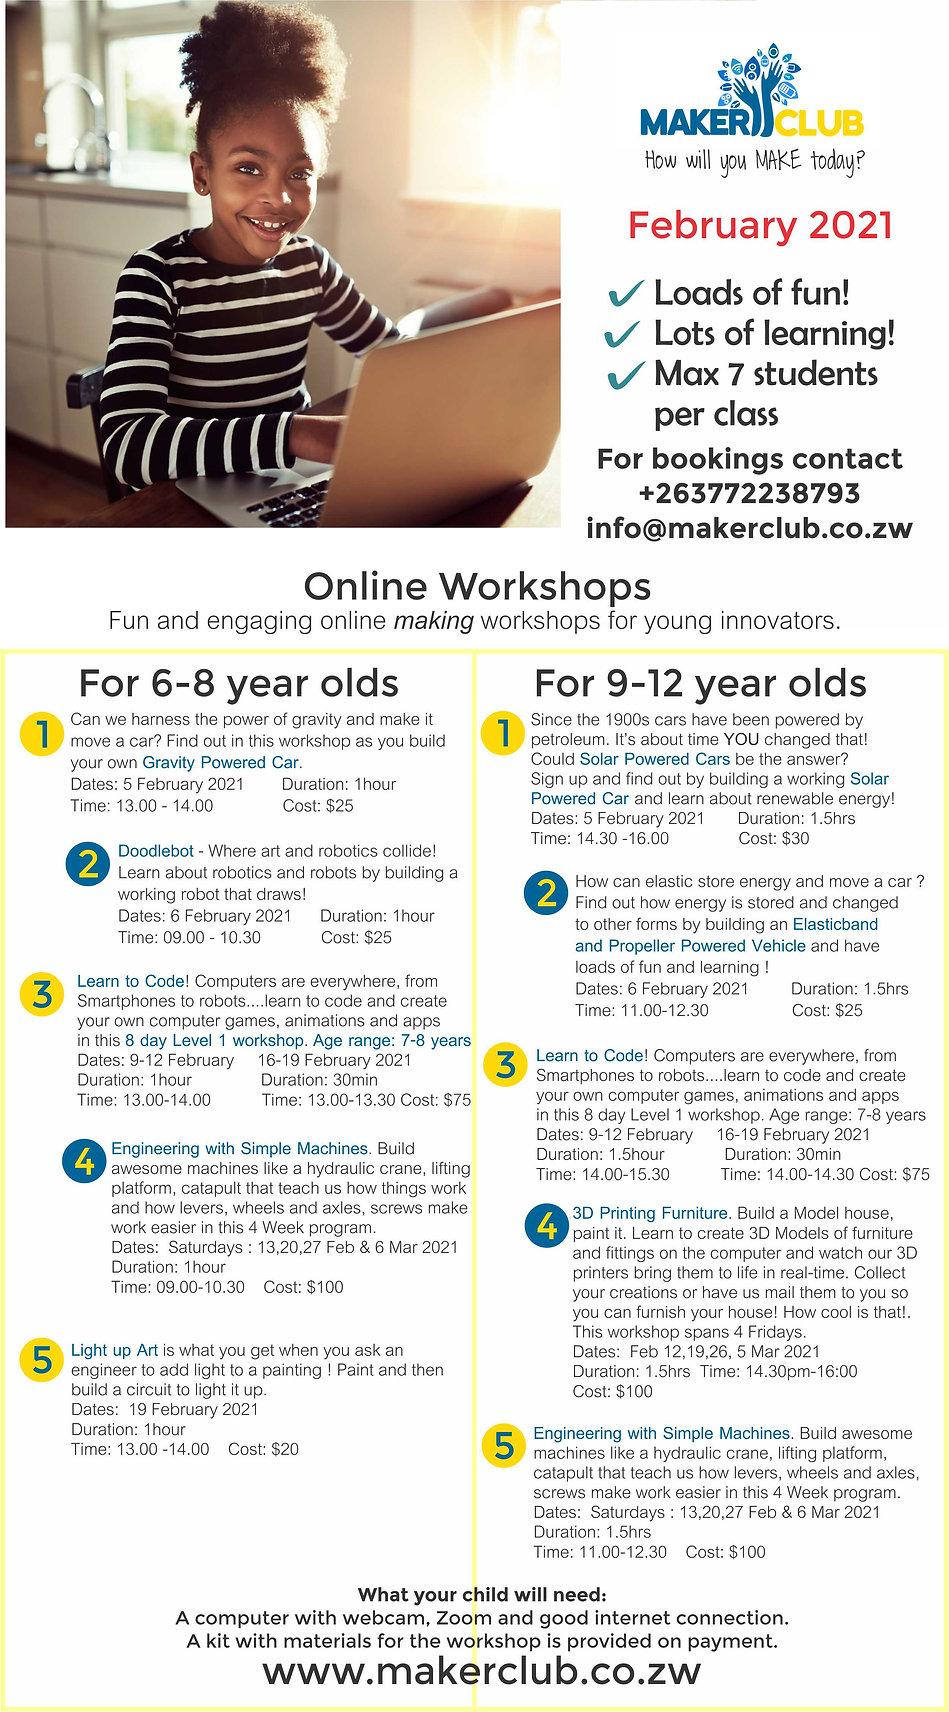 Maker Club Kids February 2021.jpg